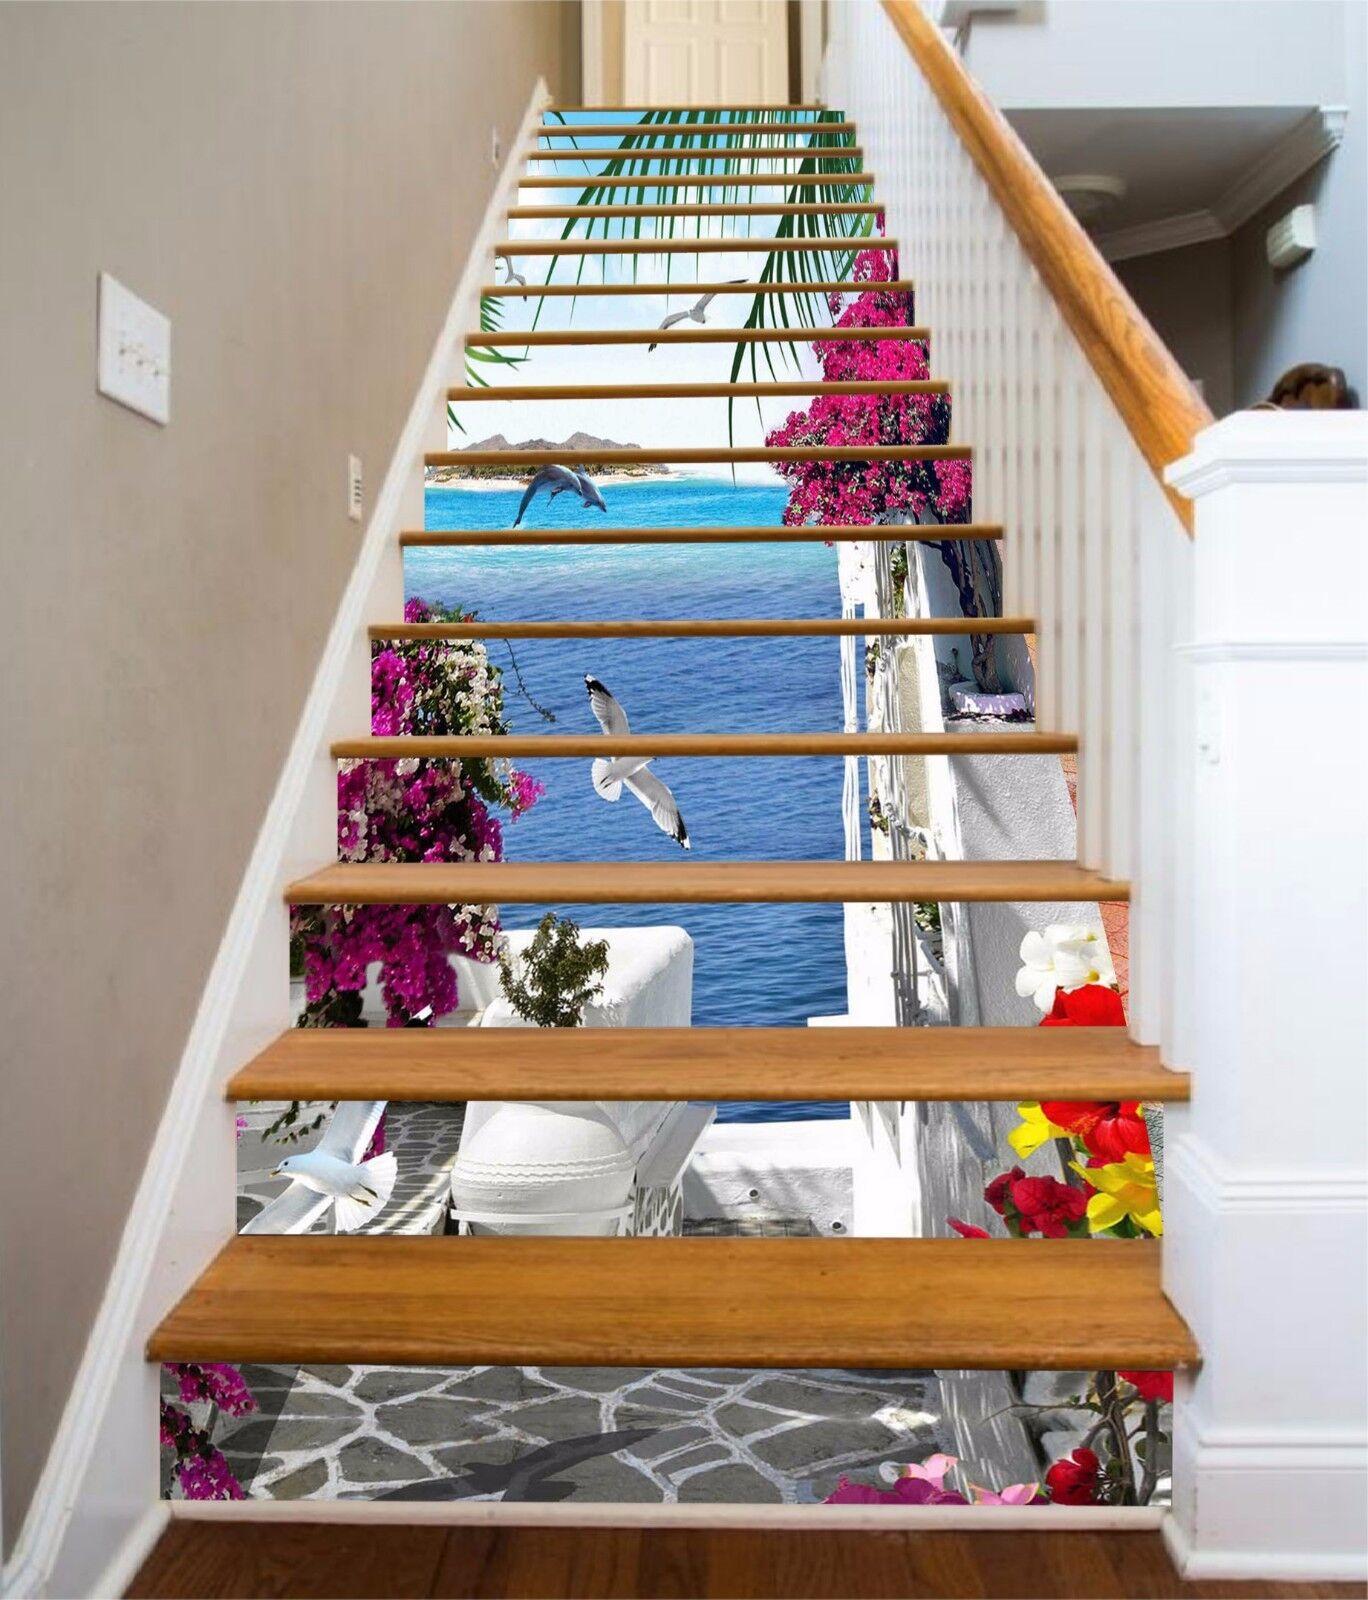 3D House sea 35  Stair Risers Decoration Photo Mural Vinyl Decal Wallpaper UK